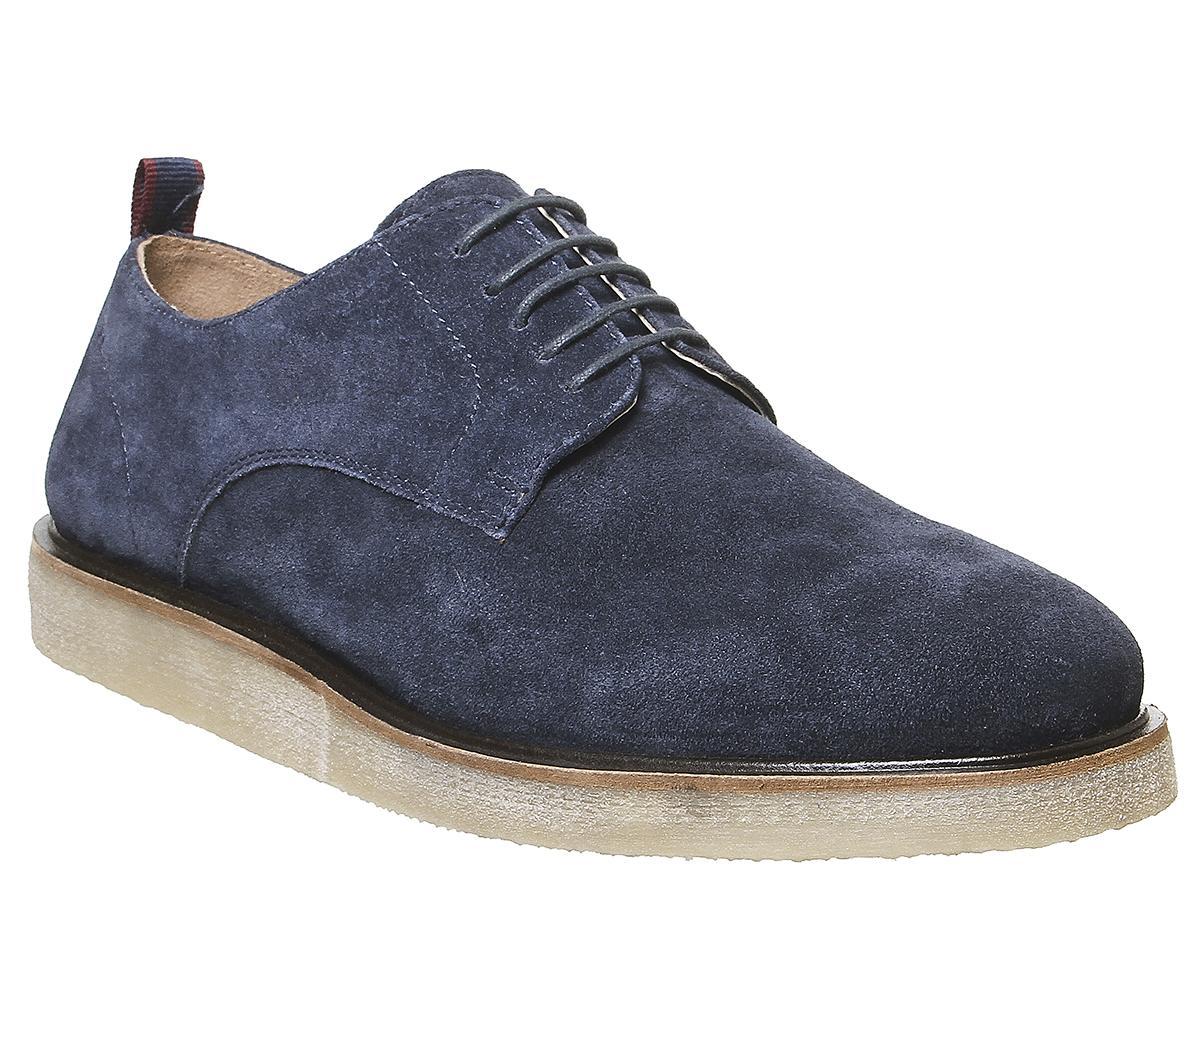 Cade Derby Shoes